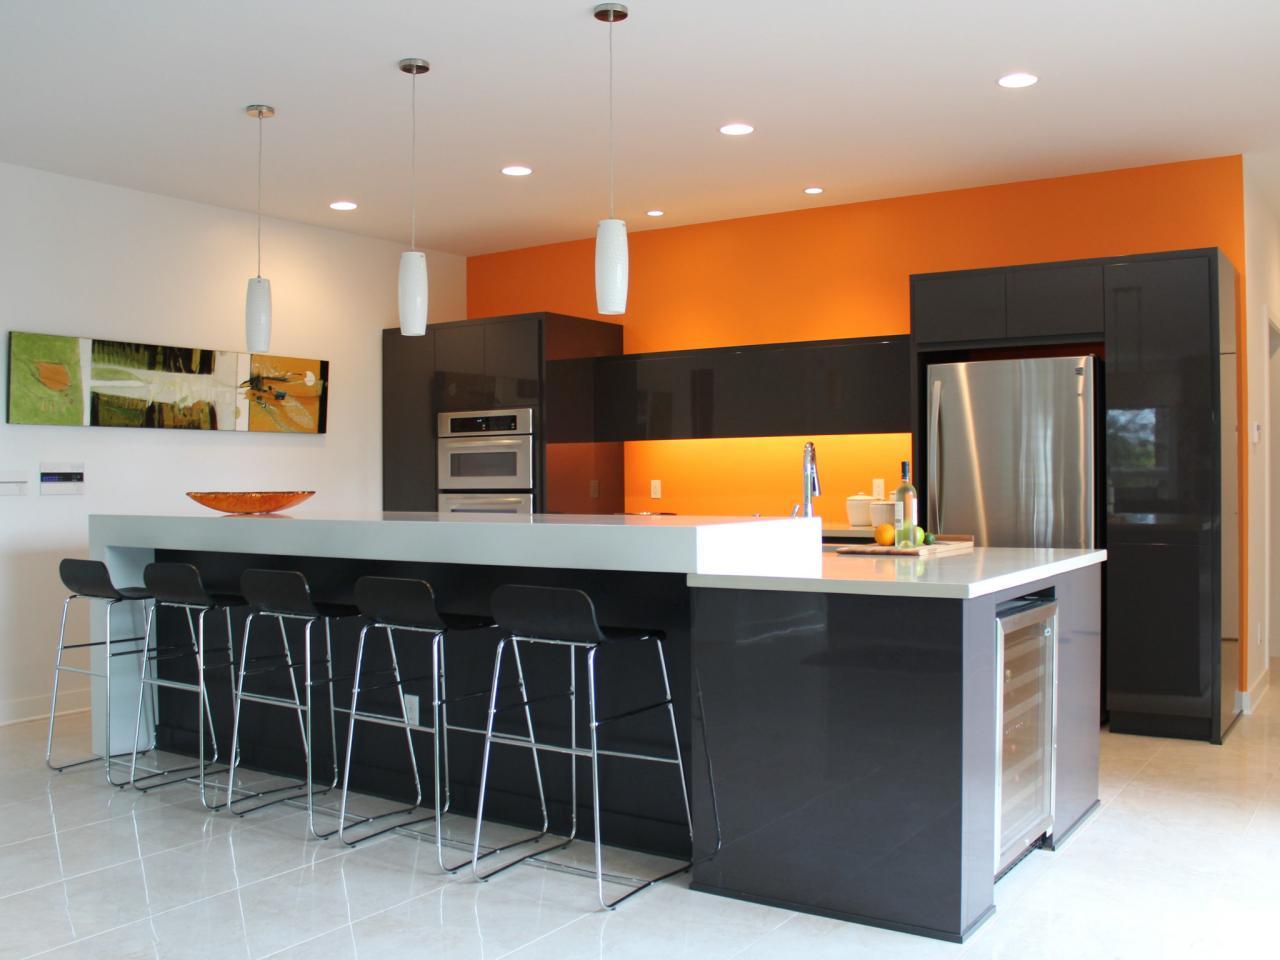 Pastel Tone Good Color To Paint A Kitchen